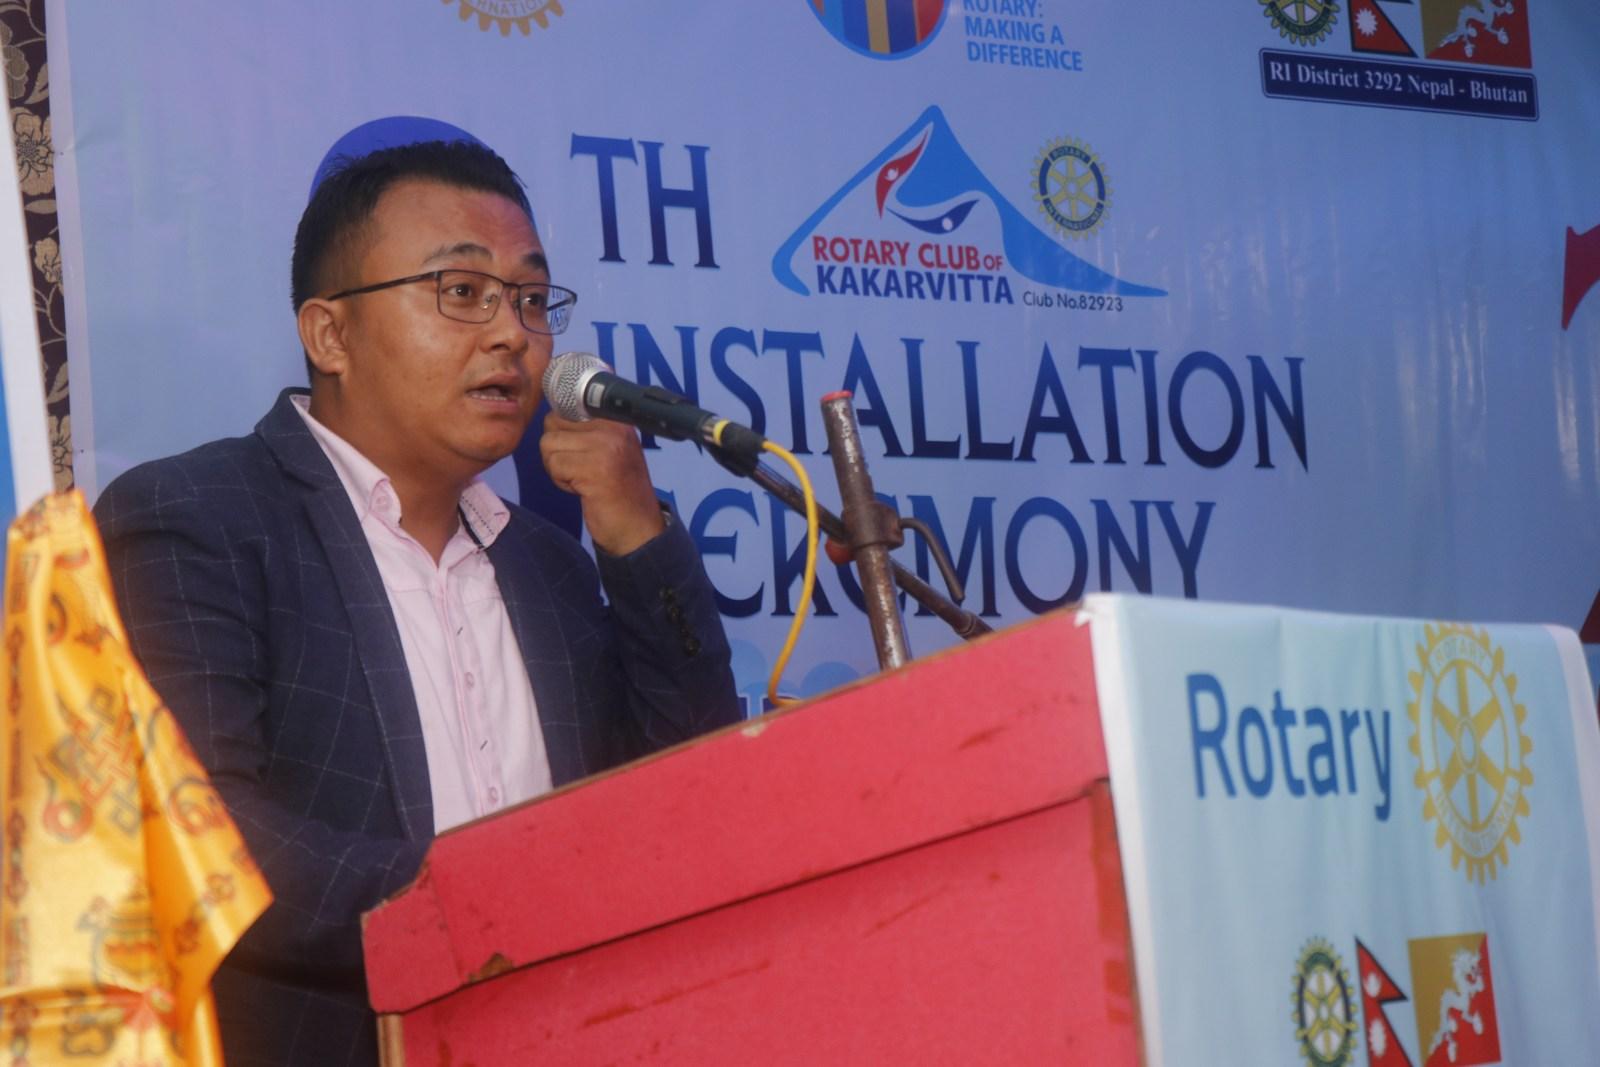 8th-Installation-Ceremony-Rotary-Club-of-Kakarvitta-56